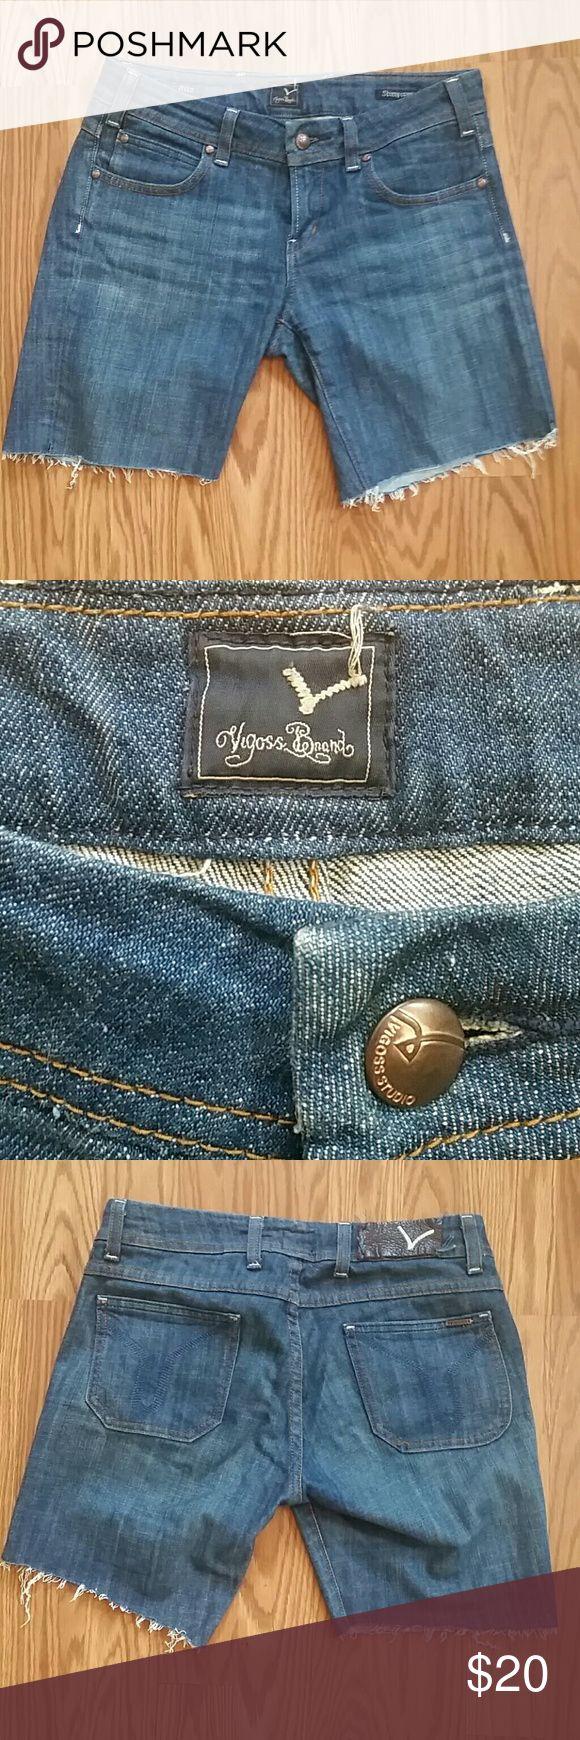 Vigoss Cutoff Jeans Homemade Vigoss Cutoffs, originally Ritz cut Skinny Capris, now ultra cool designer cutoff shorts   Size 29  See photos for leg measurements   Thanks! Vigoss Shorts Jean Shorts